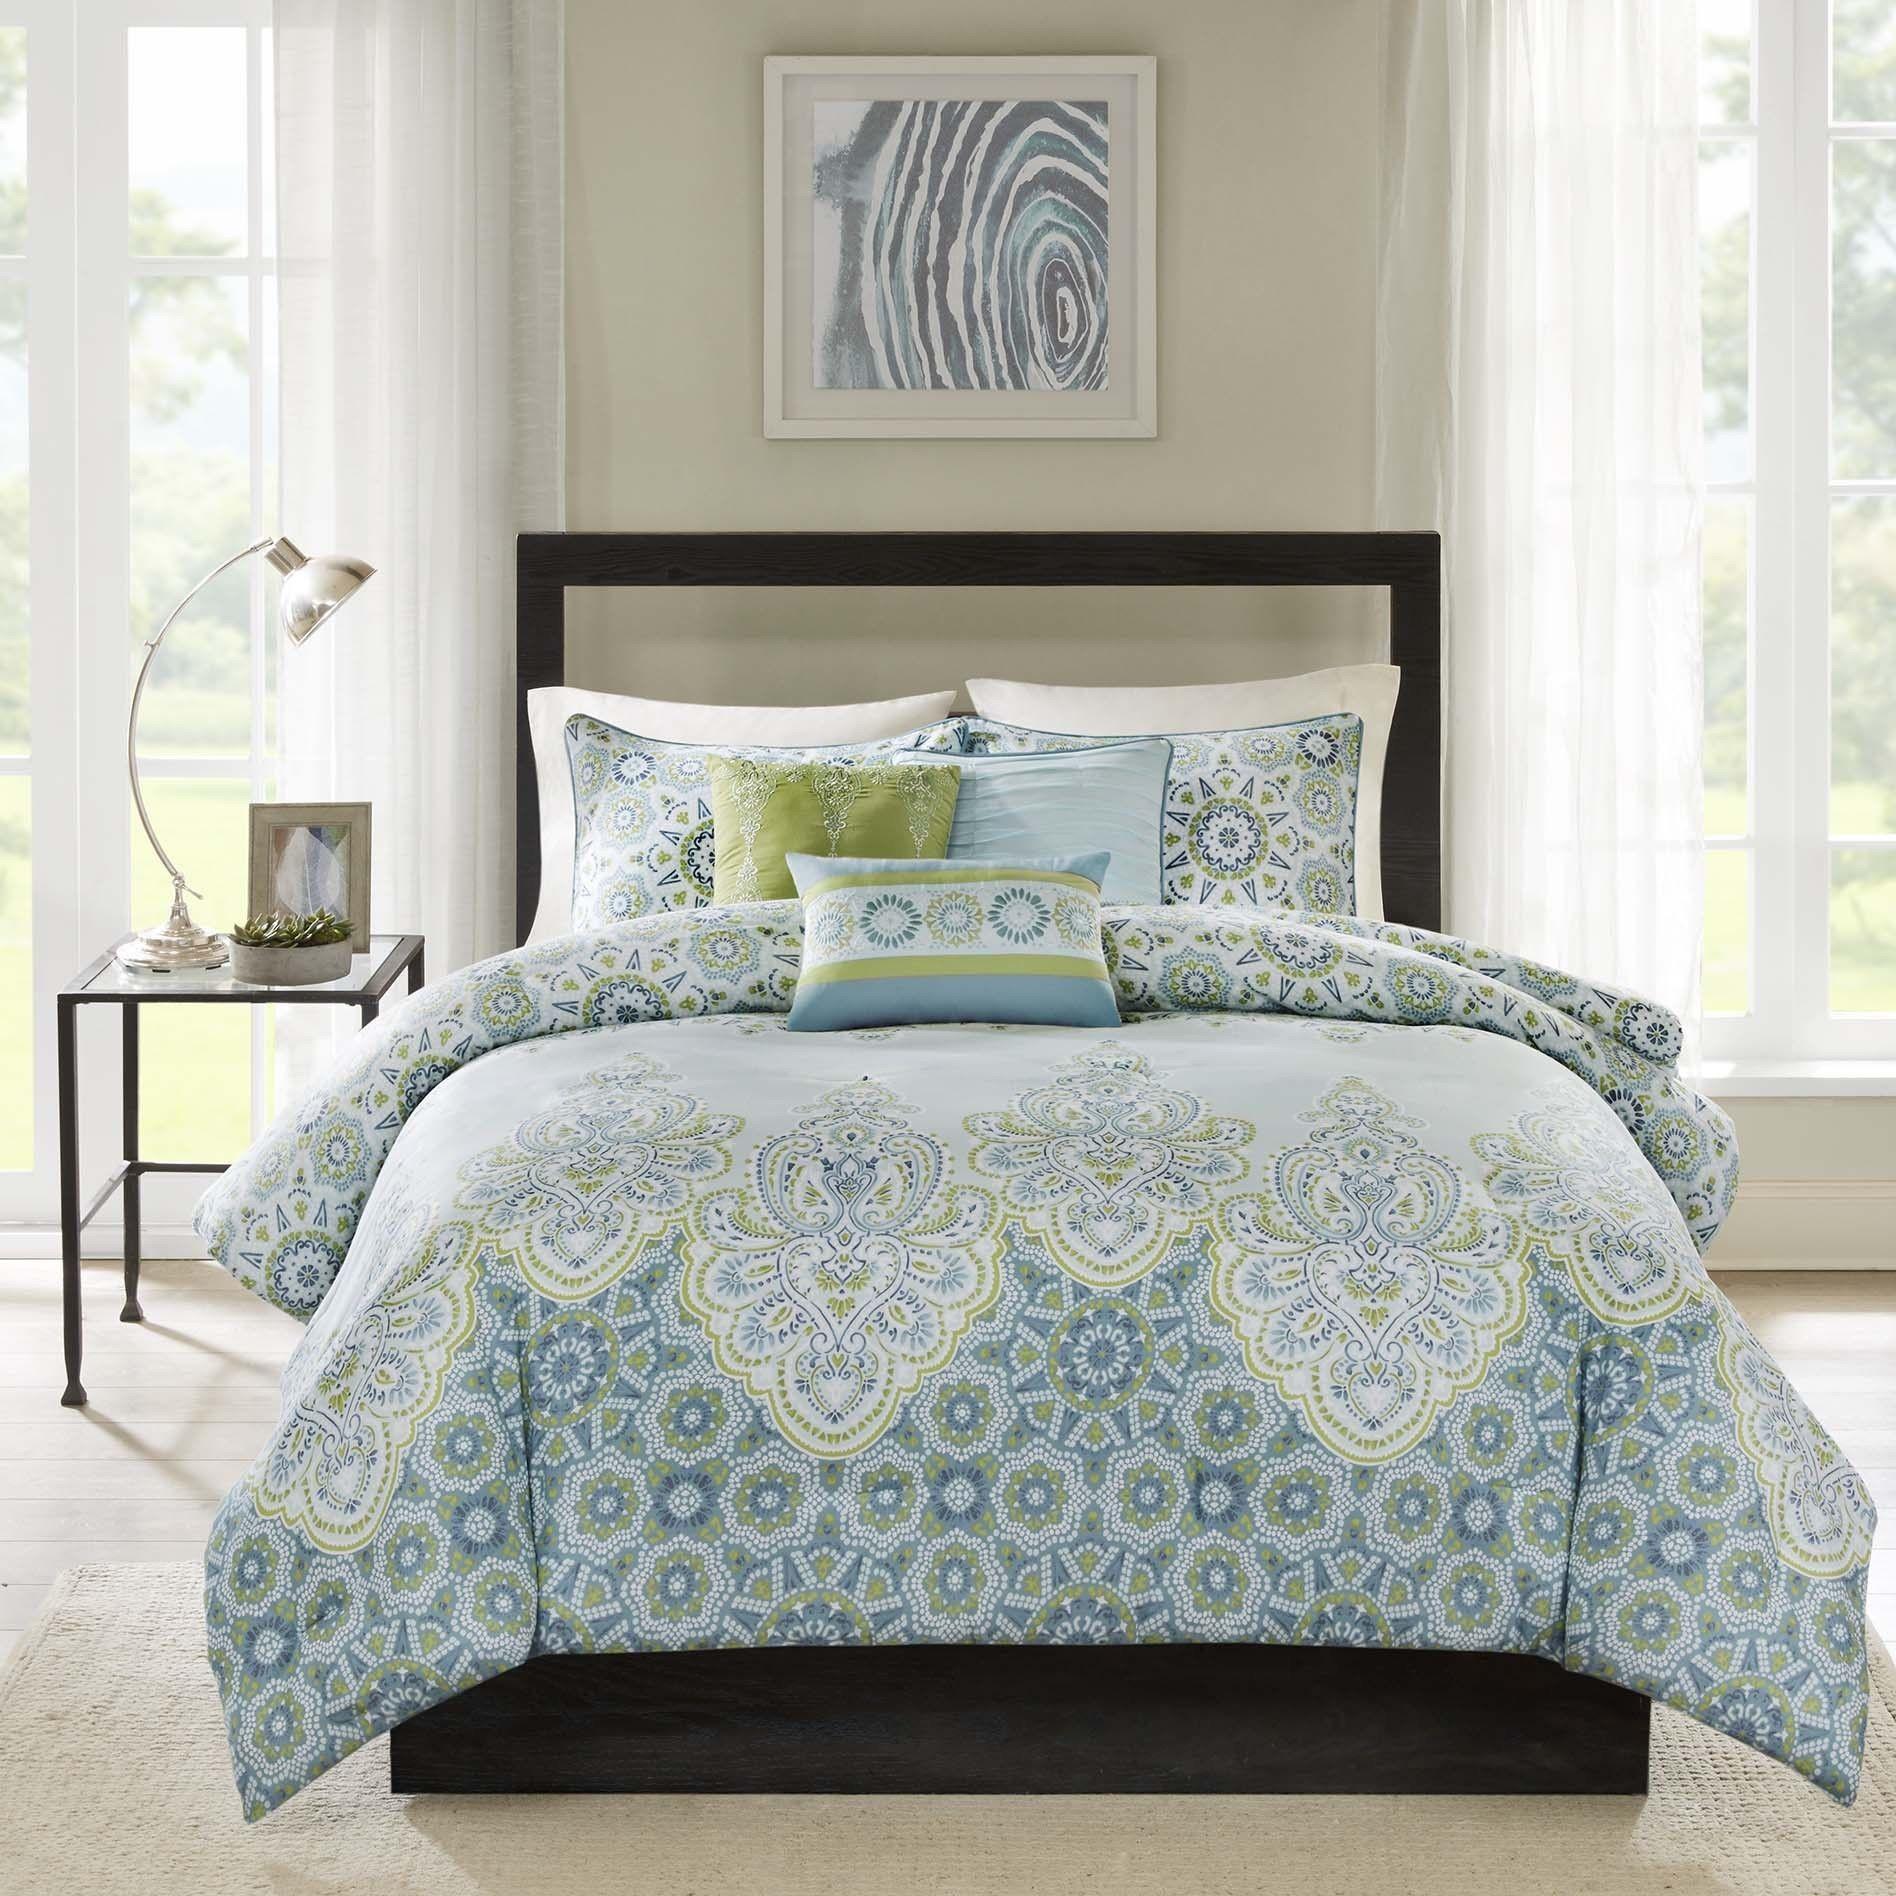 valencia silver set comforters purple sets piece and ideas park gray madison bedroom comforter duvet